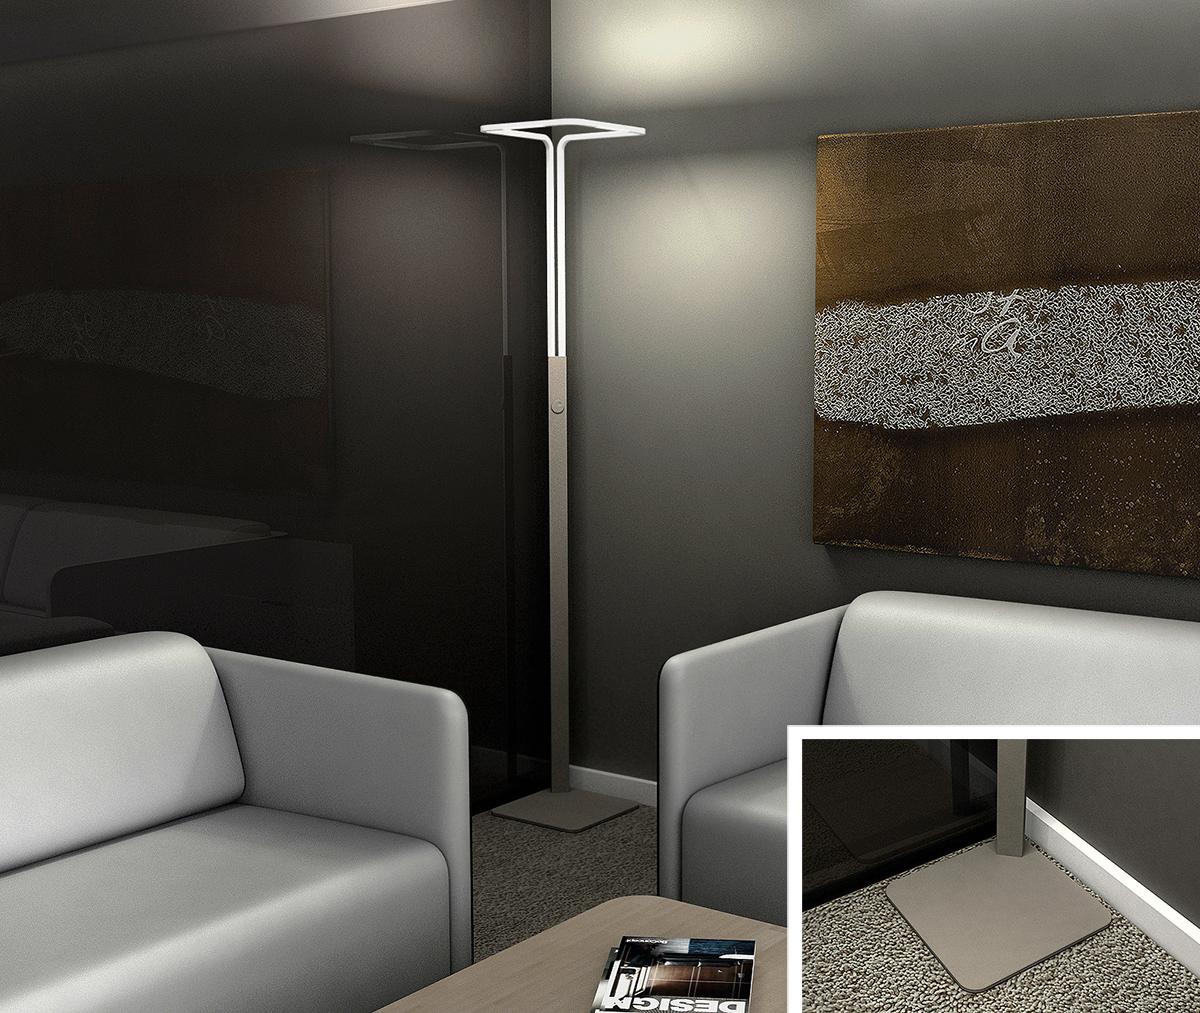 pulsar_led_floor_lamp_design_somerset_harris_rogu_lighting